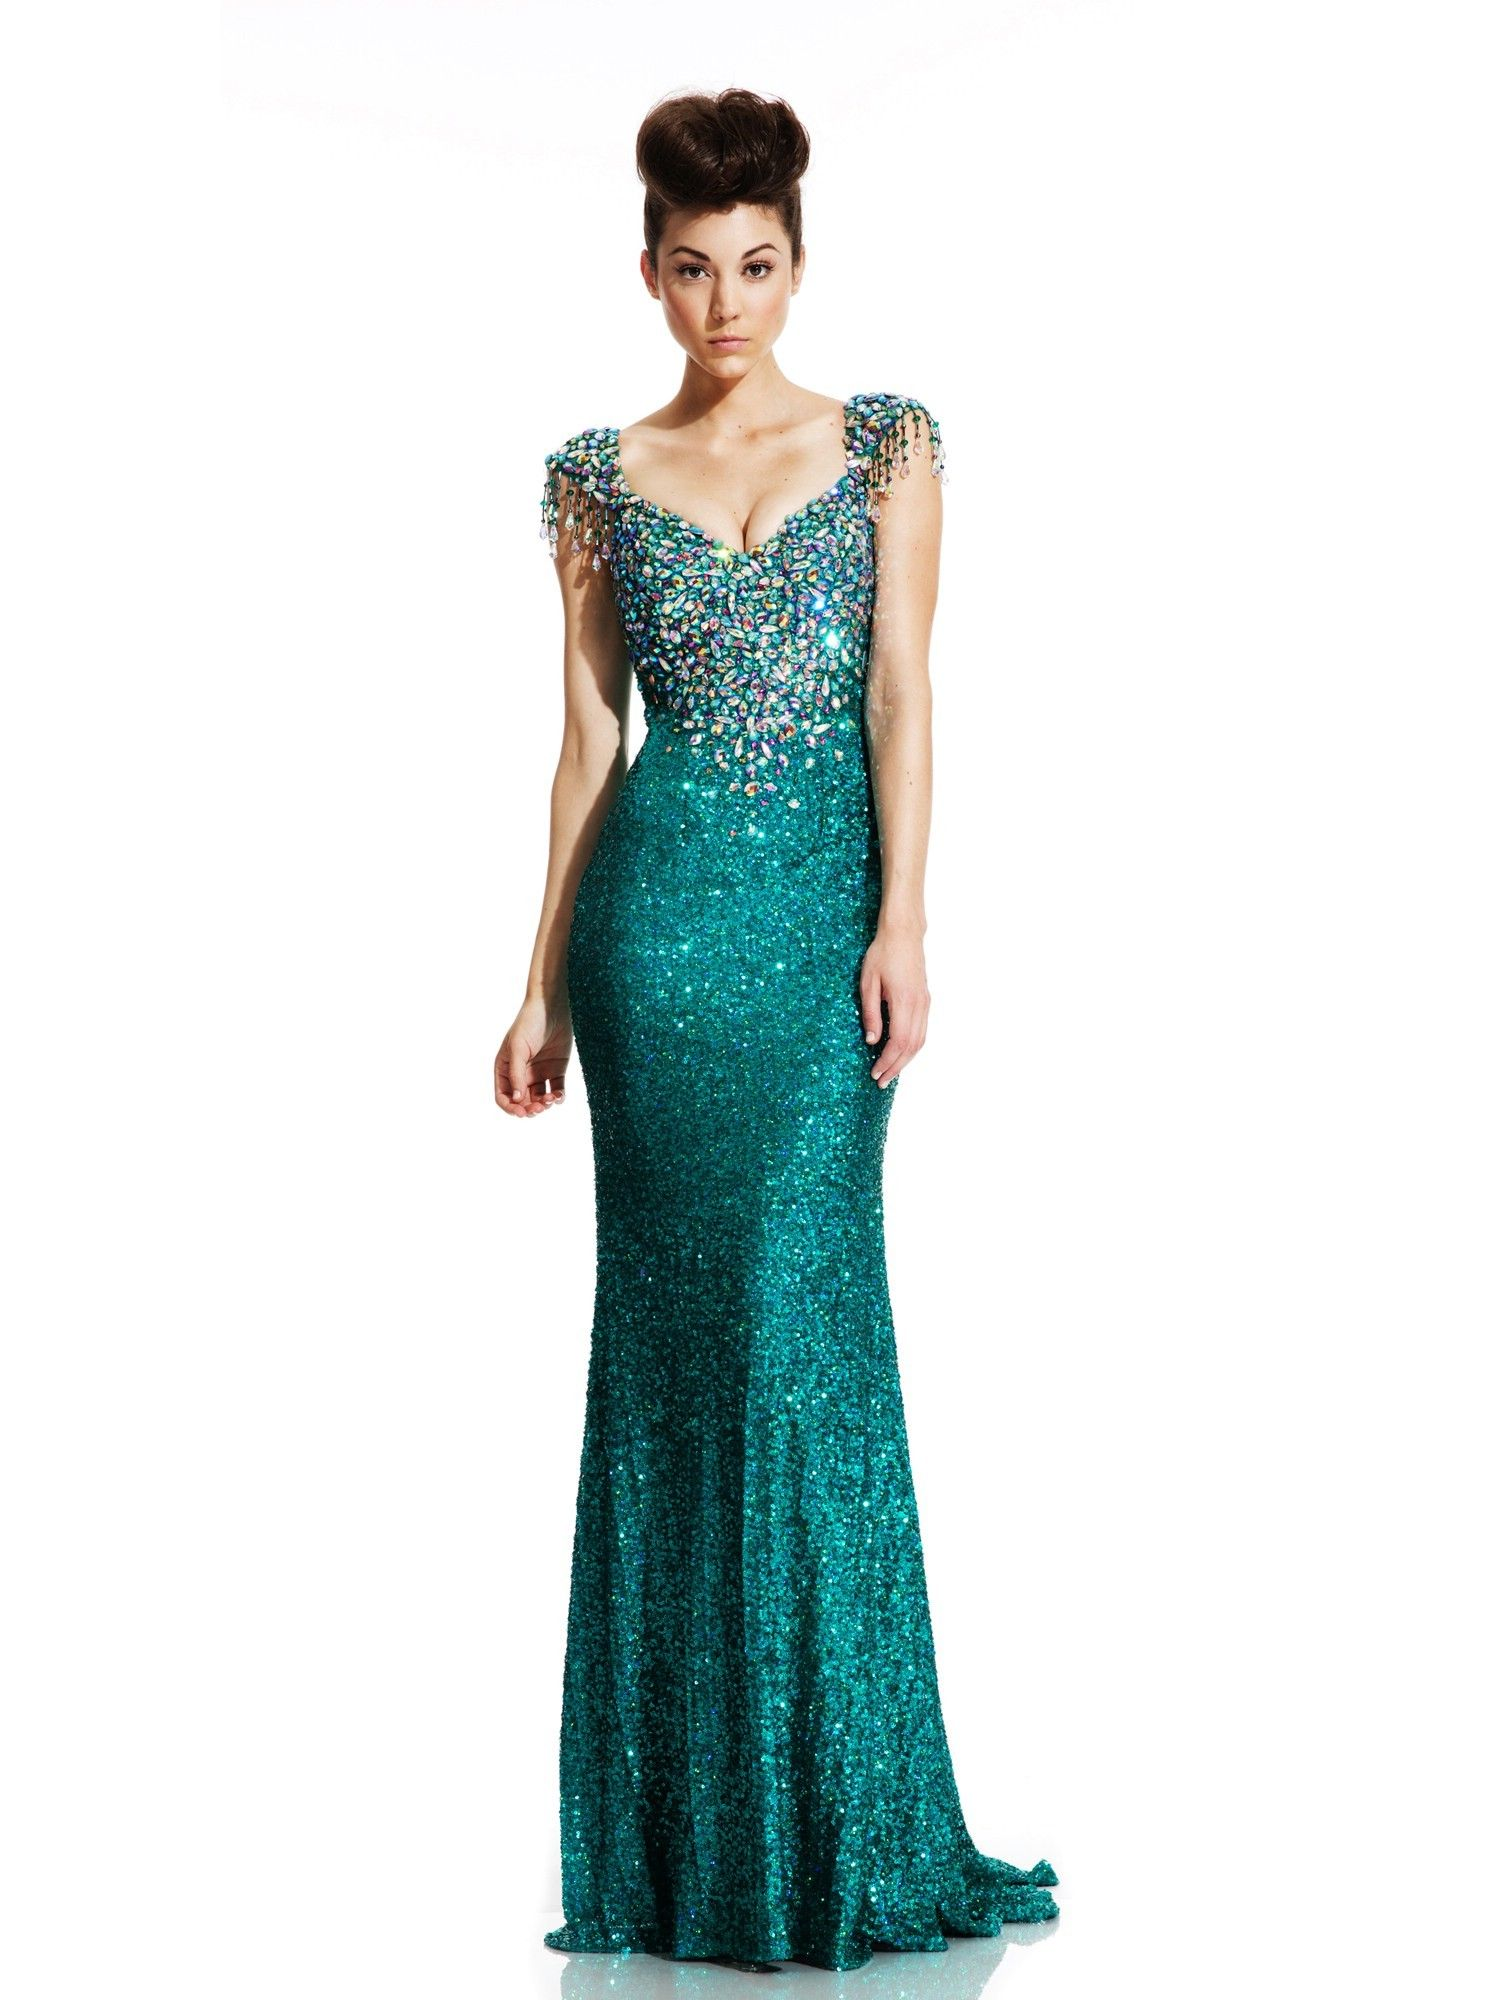 Colorful Prom Dresses Tacoma Wa Ornament - All Wedding Dresses ...